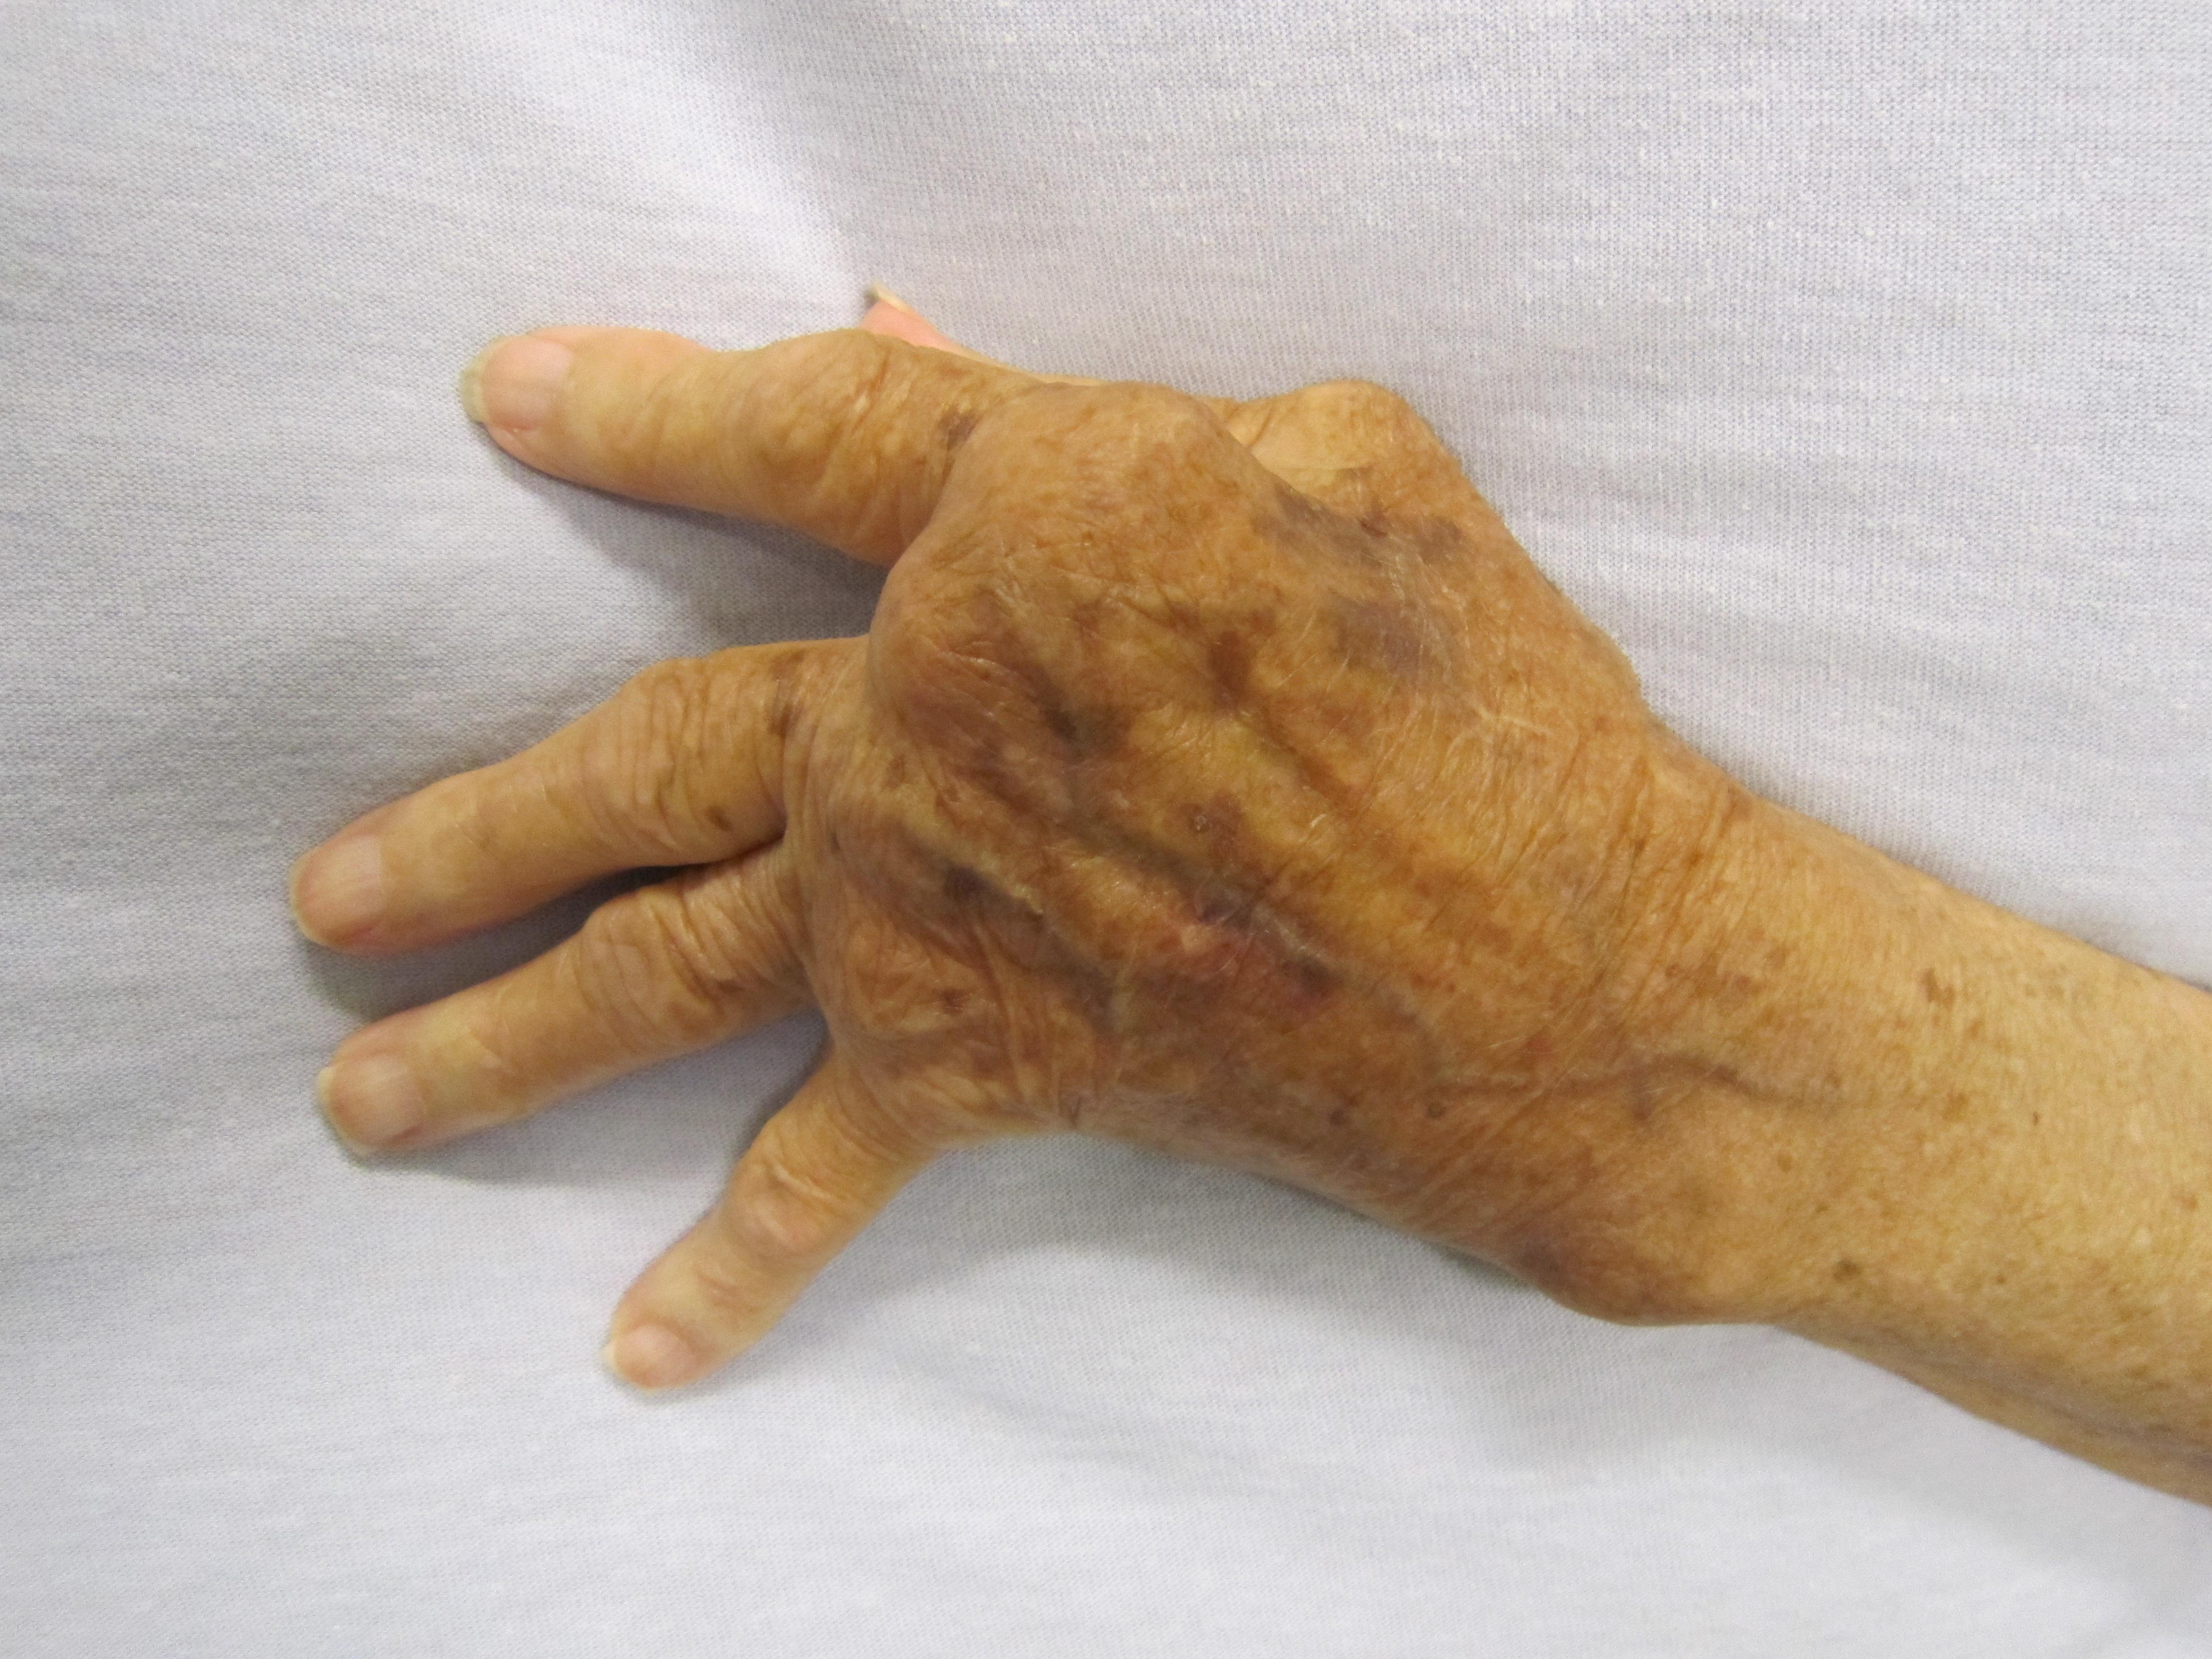 sarok artritisz)